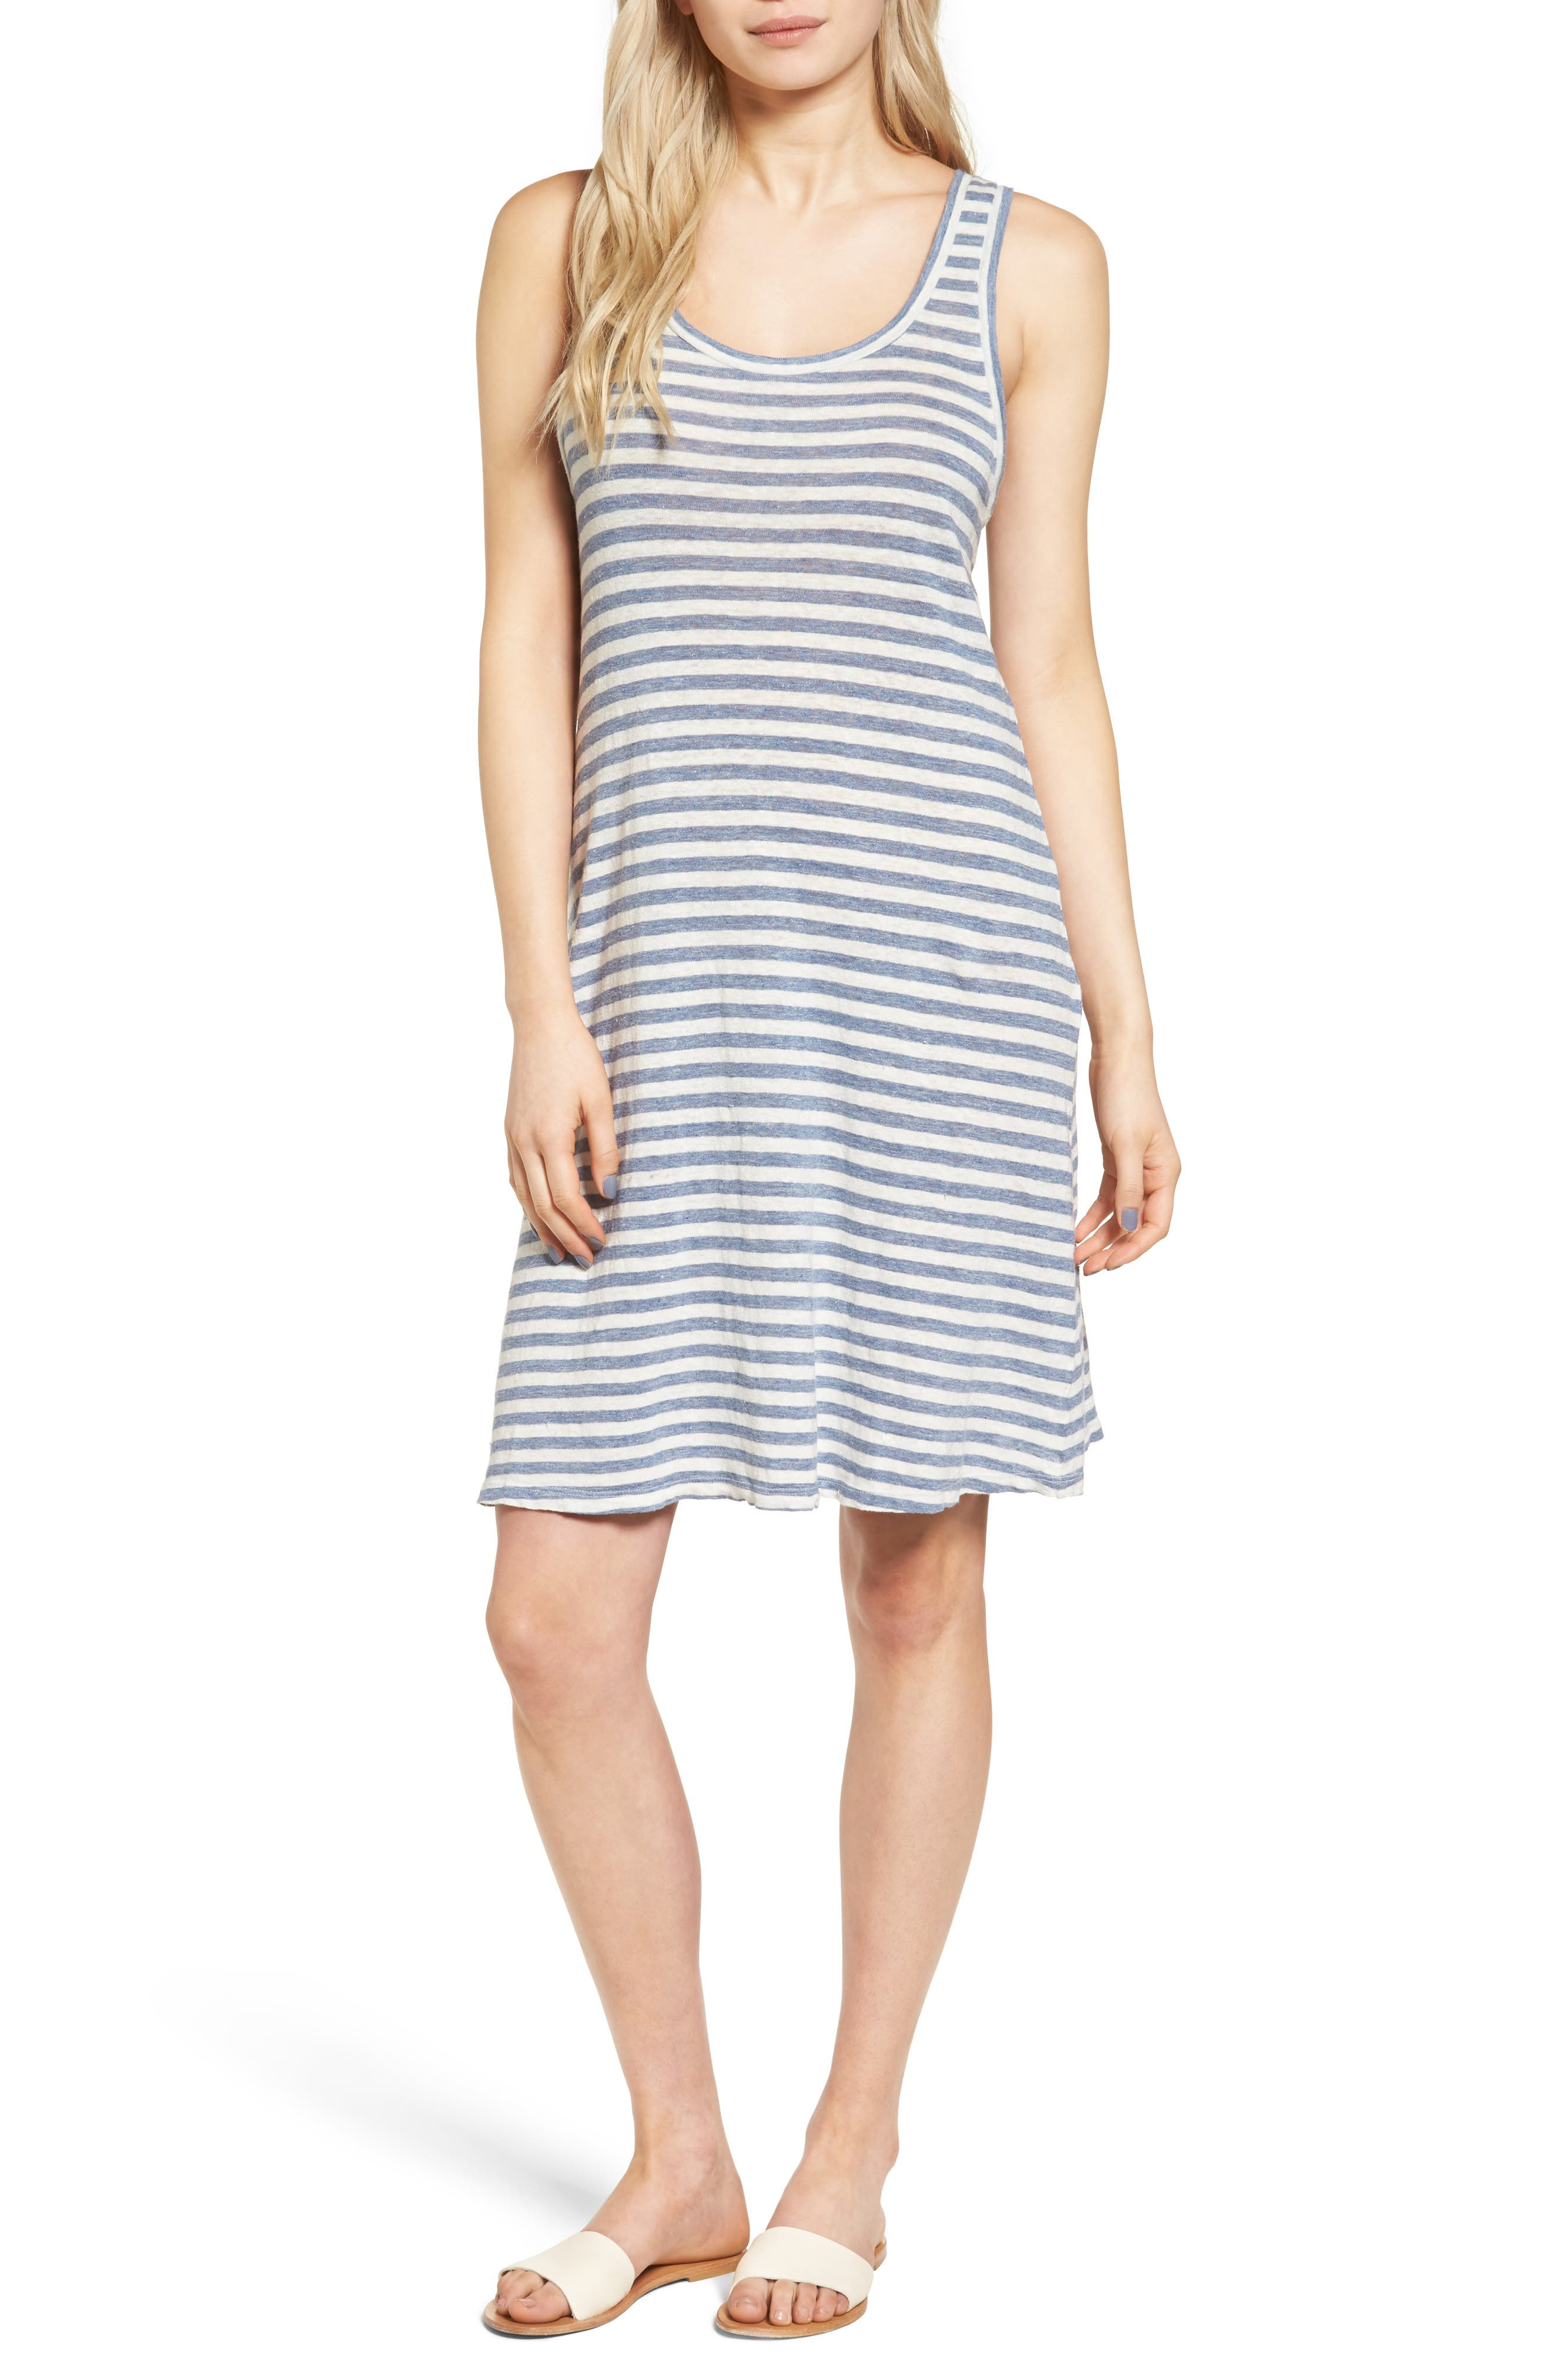 Avril Linen Tank Dress,                             Main thumbnail 1, color,                             Heather Blue/ Powder White